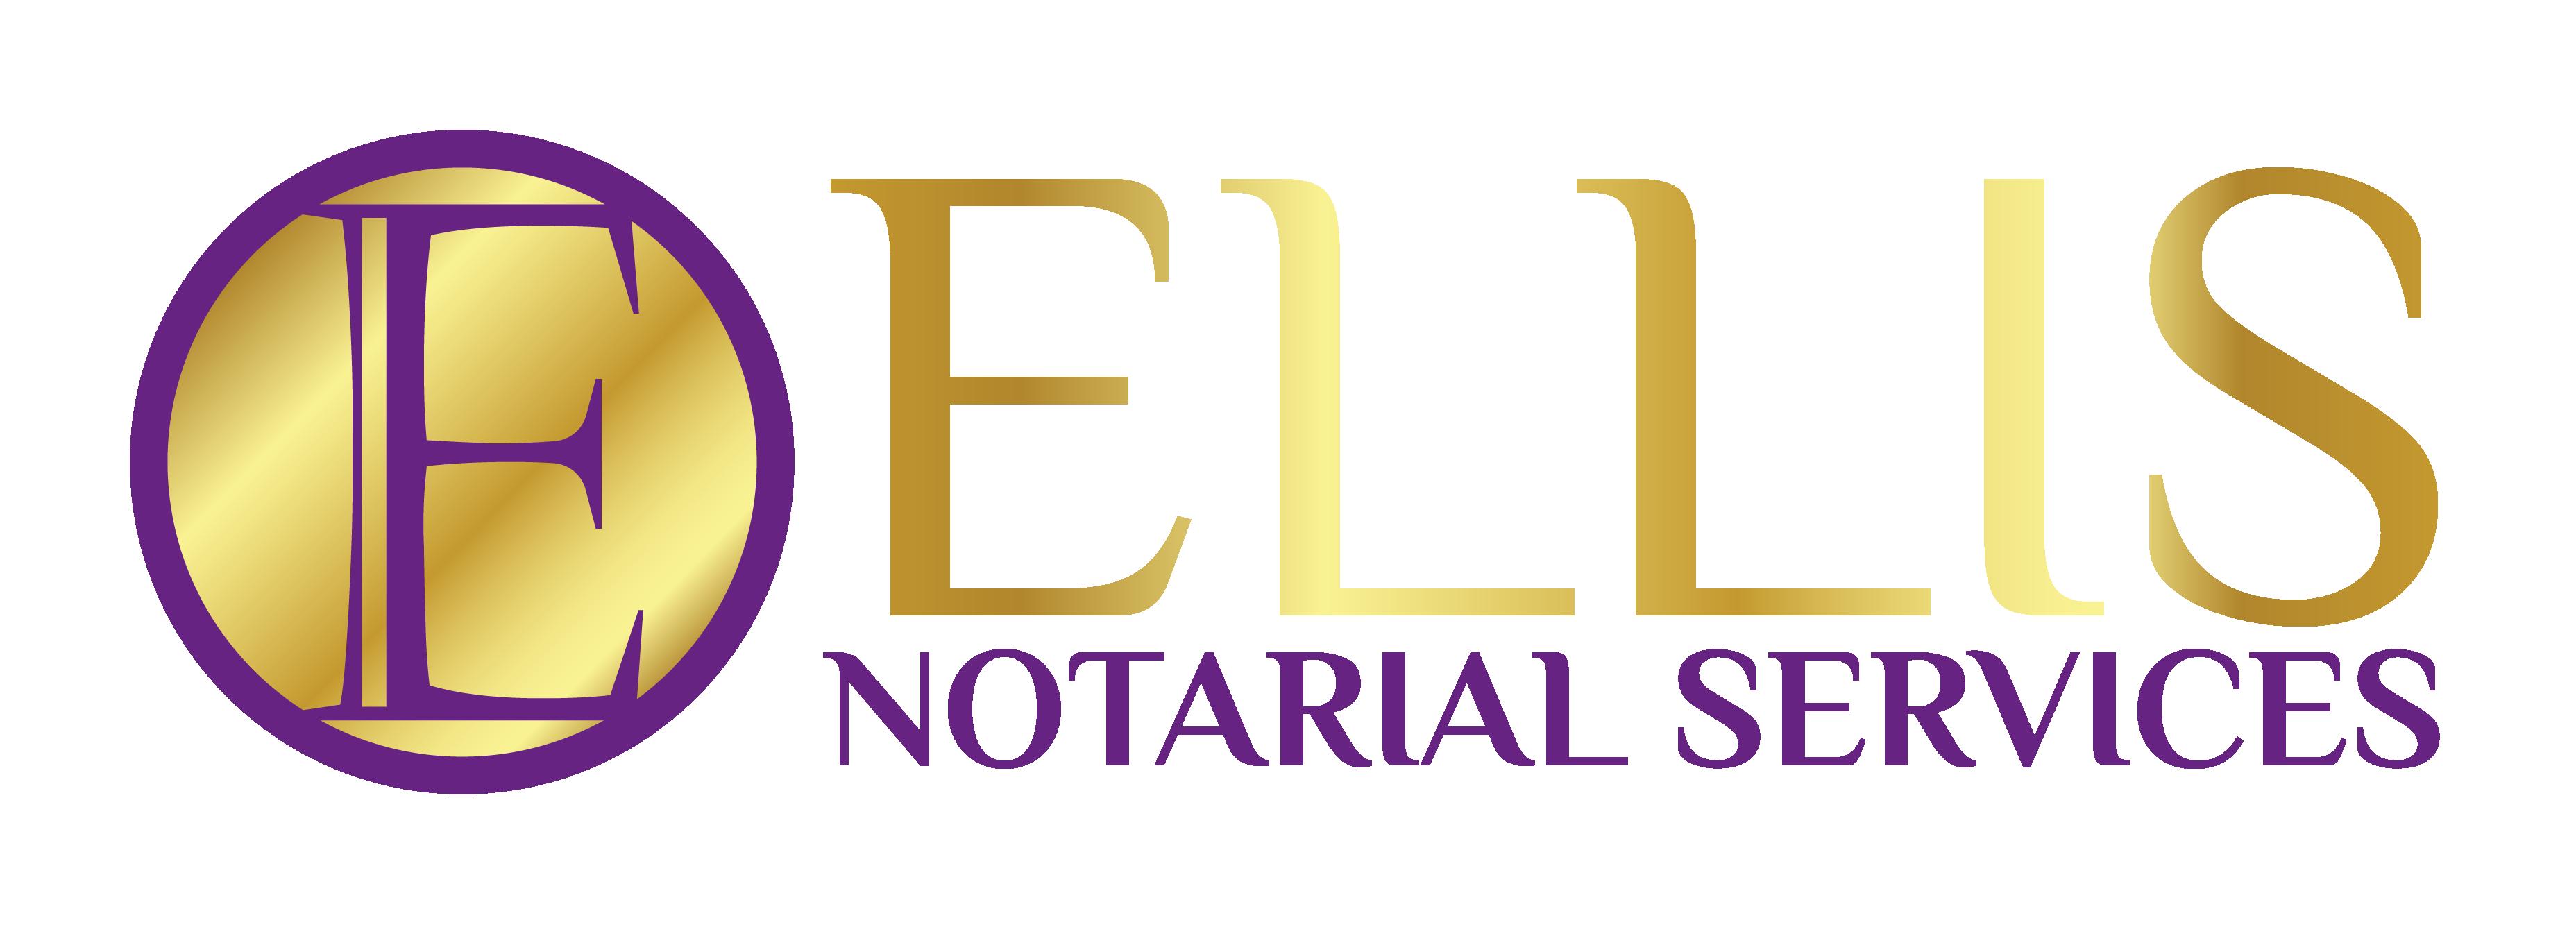 Ellis Notarial services